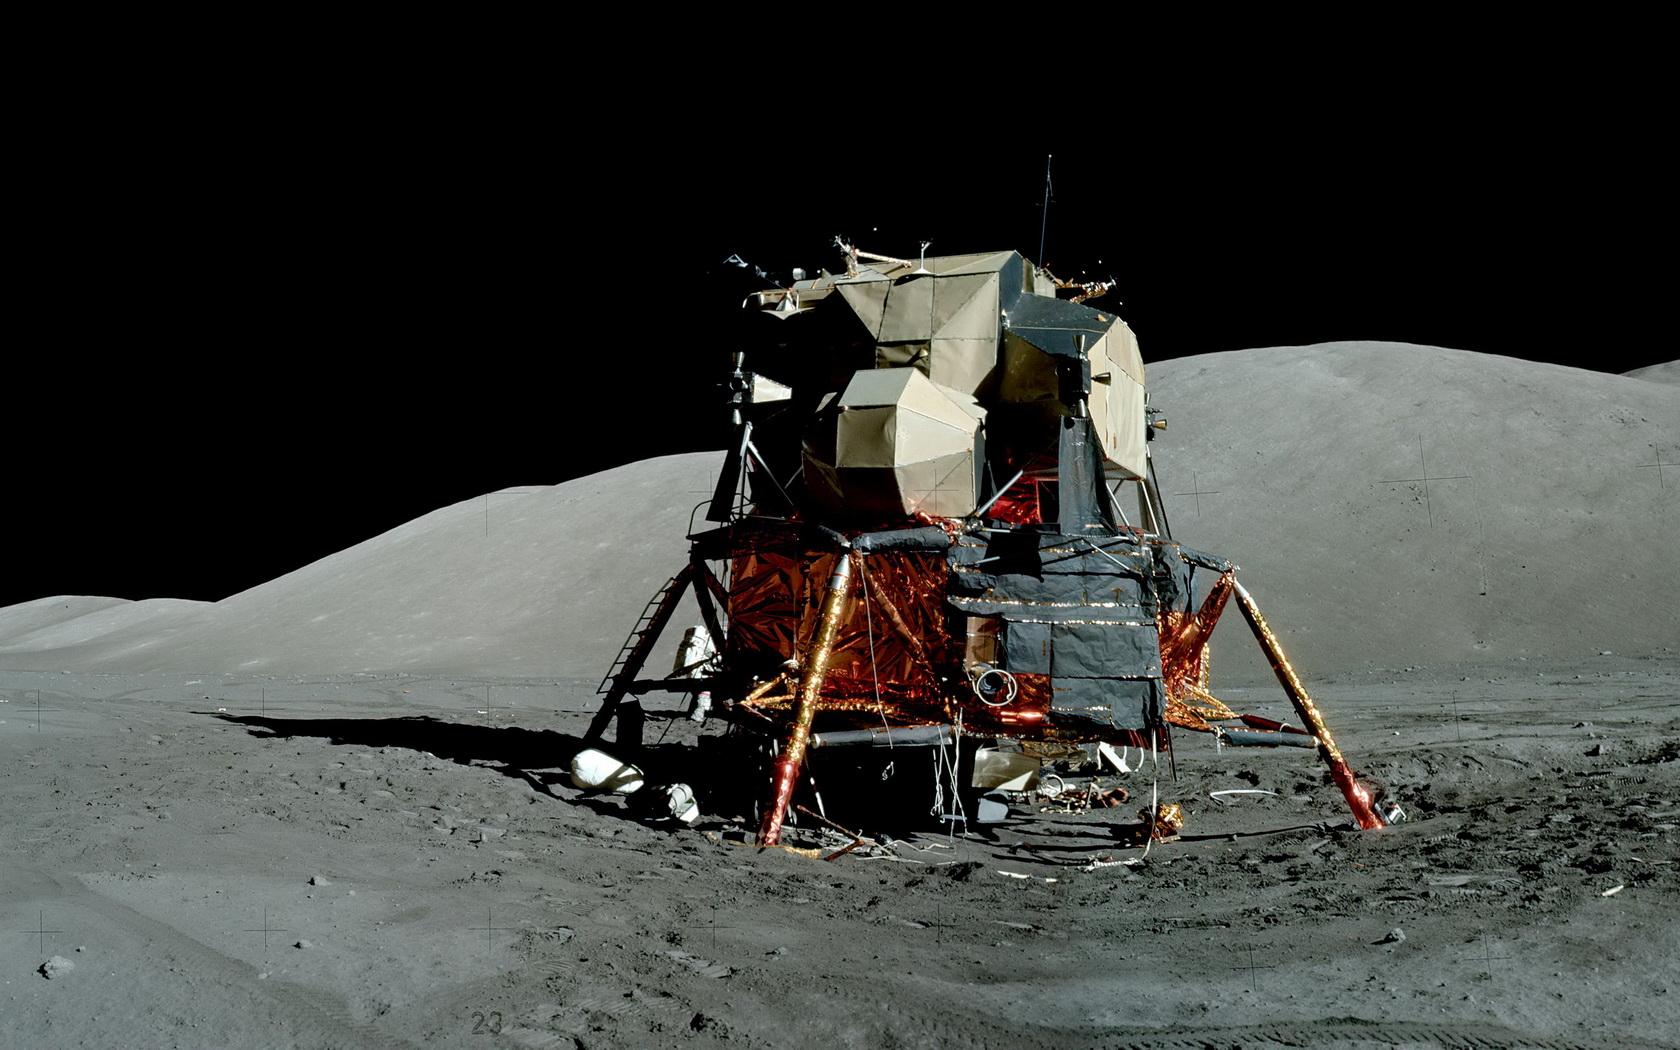 Apollo 17 Eugene Cernan LRV & LEM NASA Photo Print for Sale